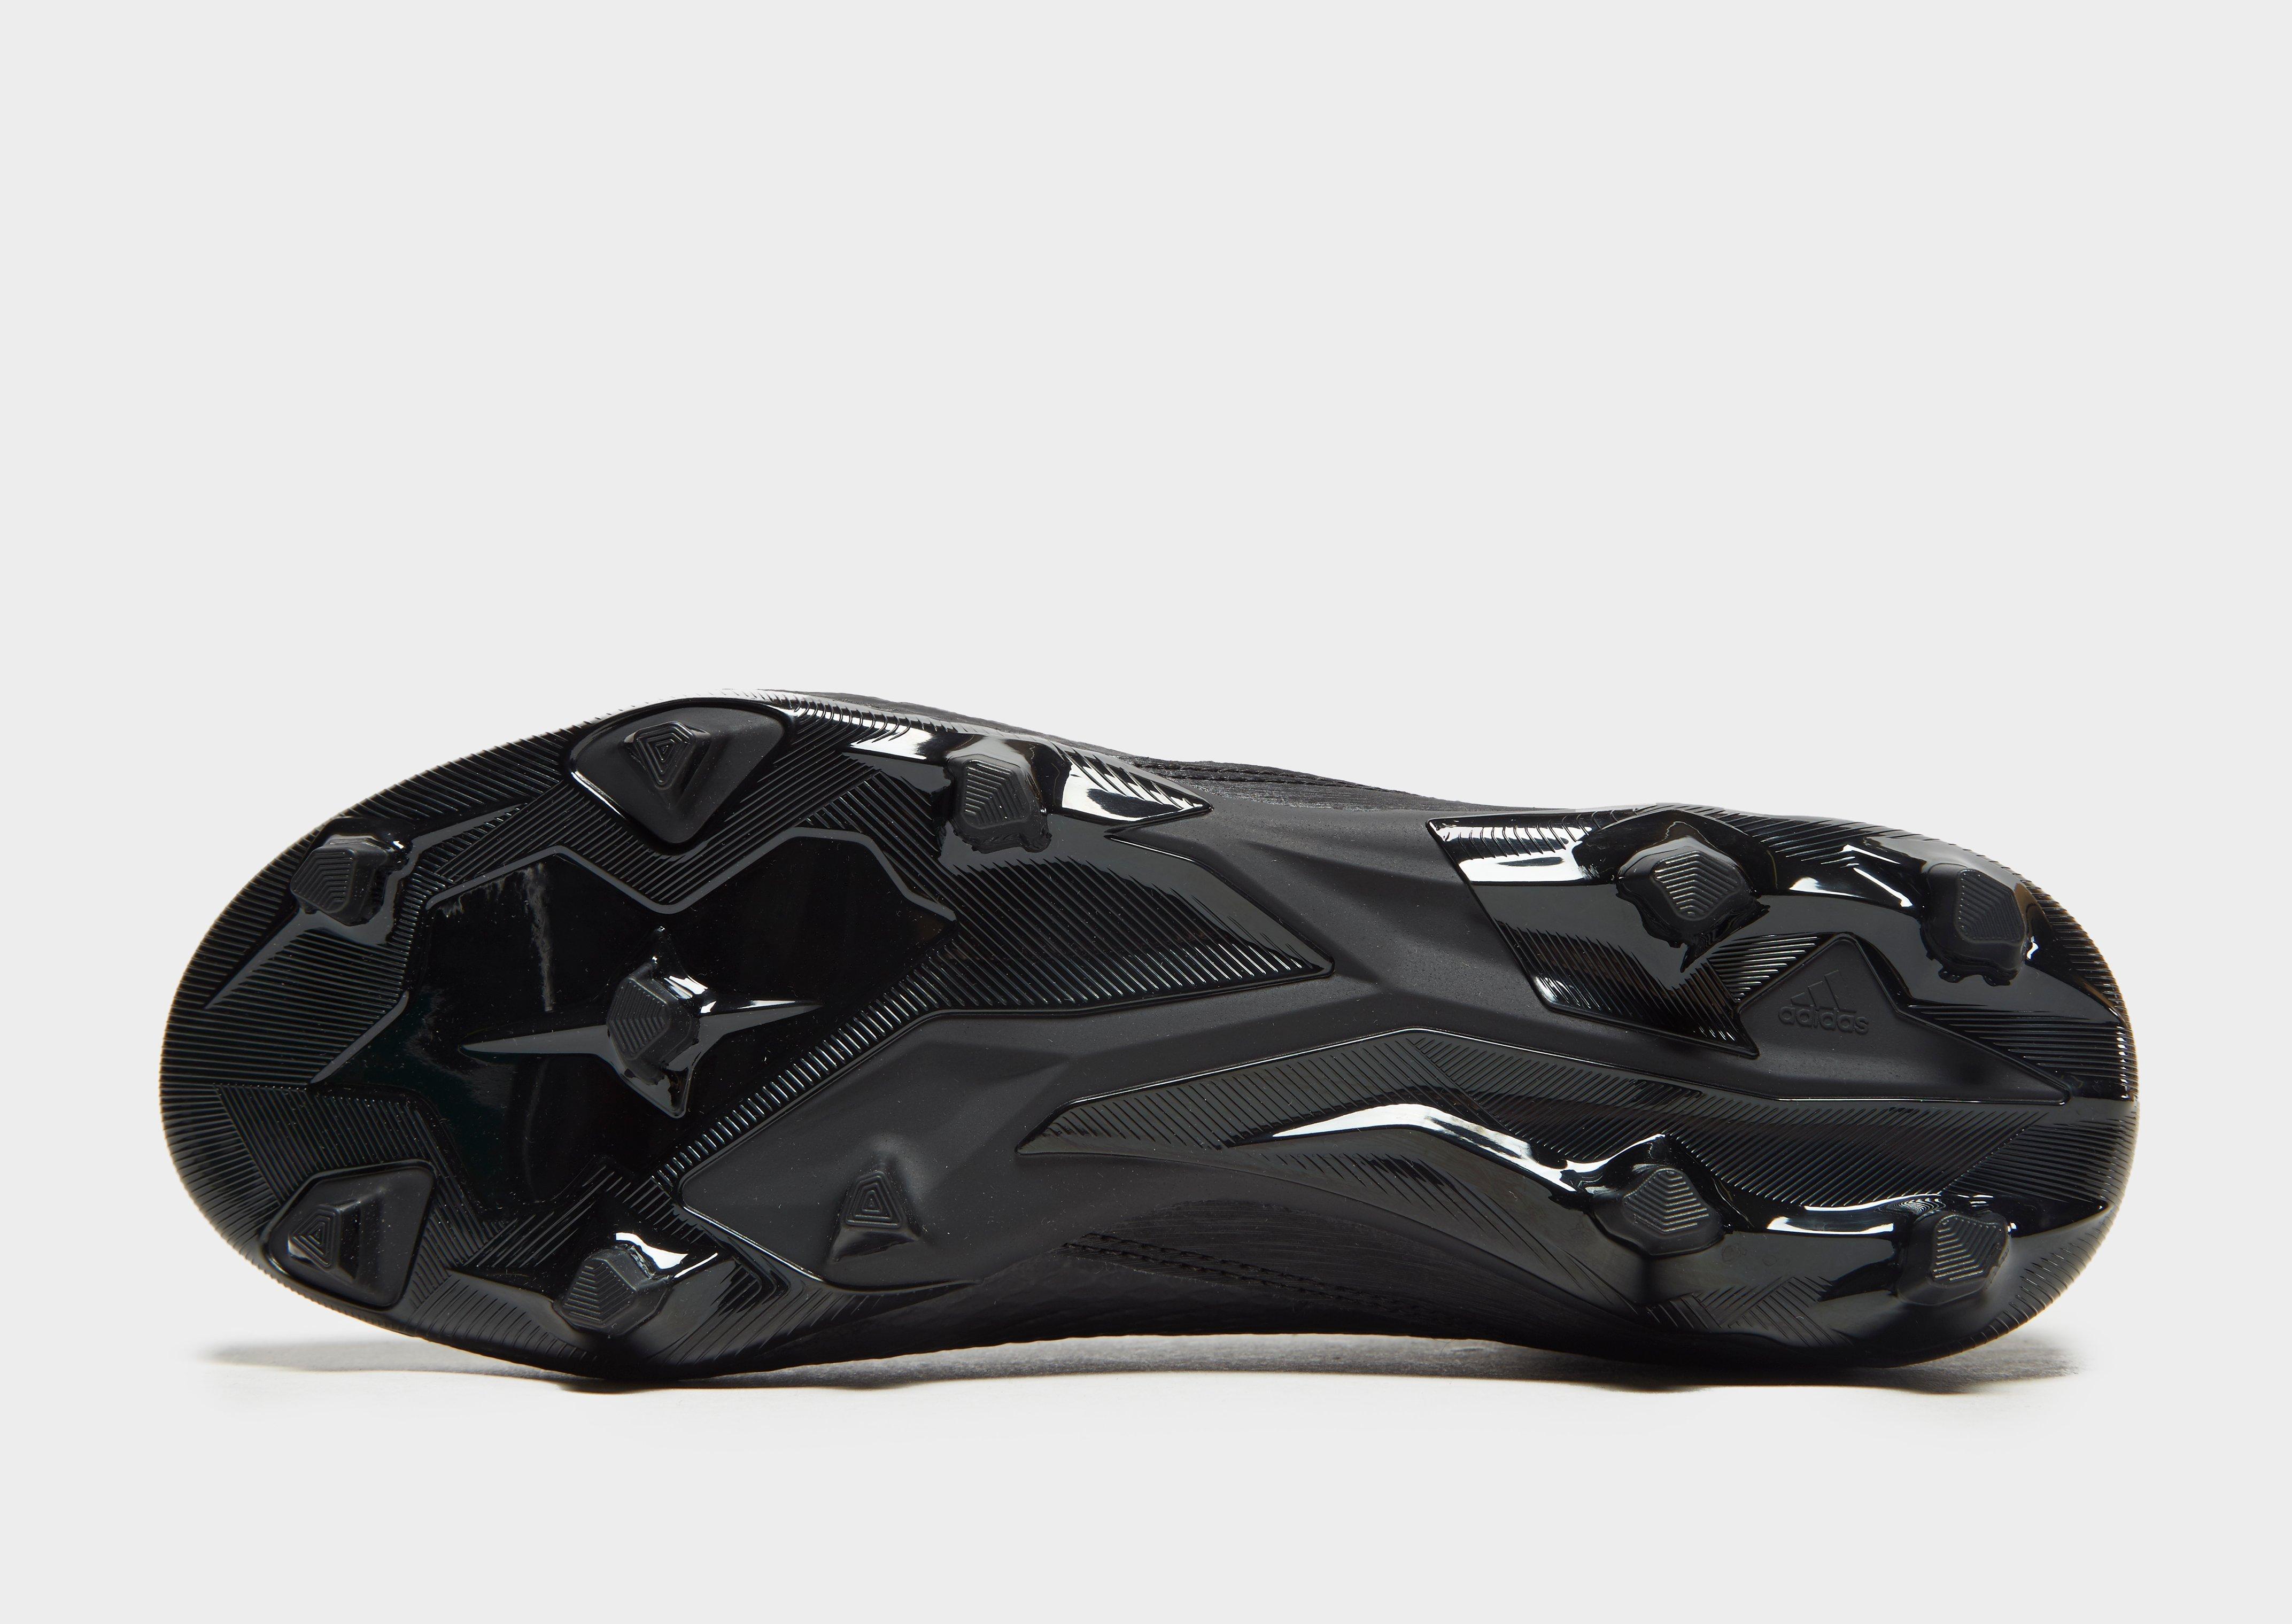 adidas Archetic Predator 19.3 FG